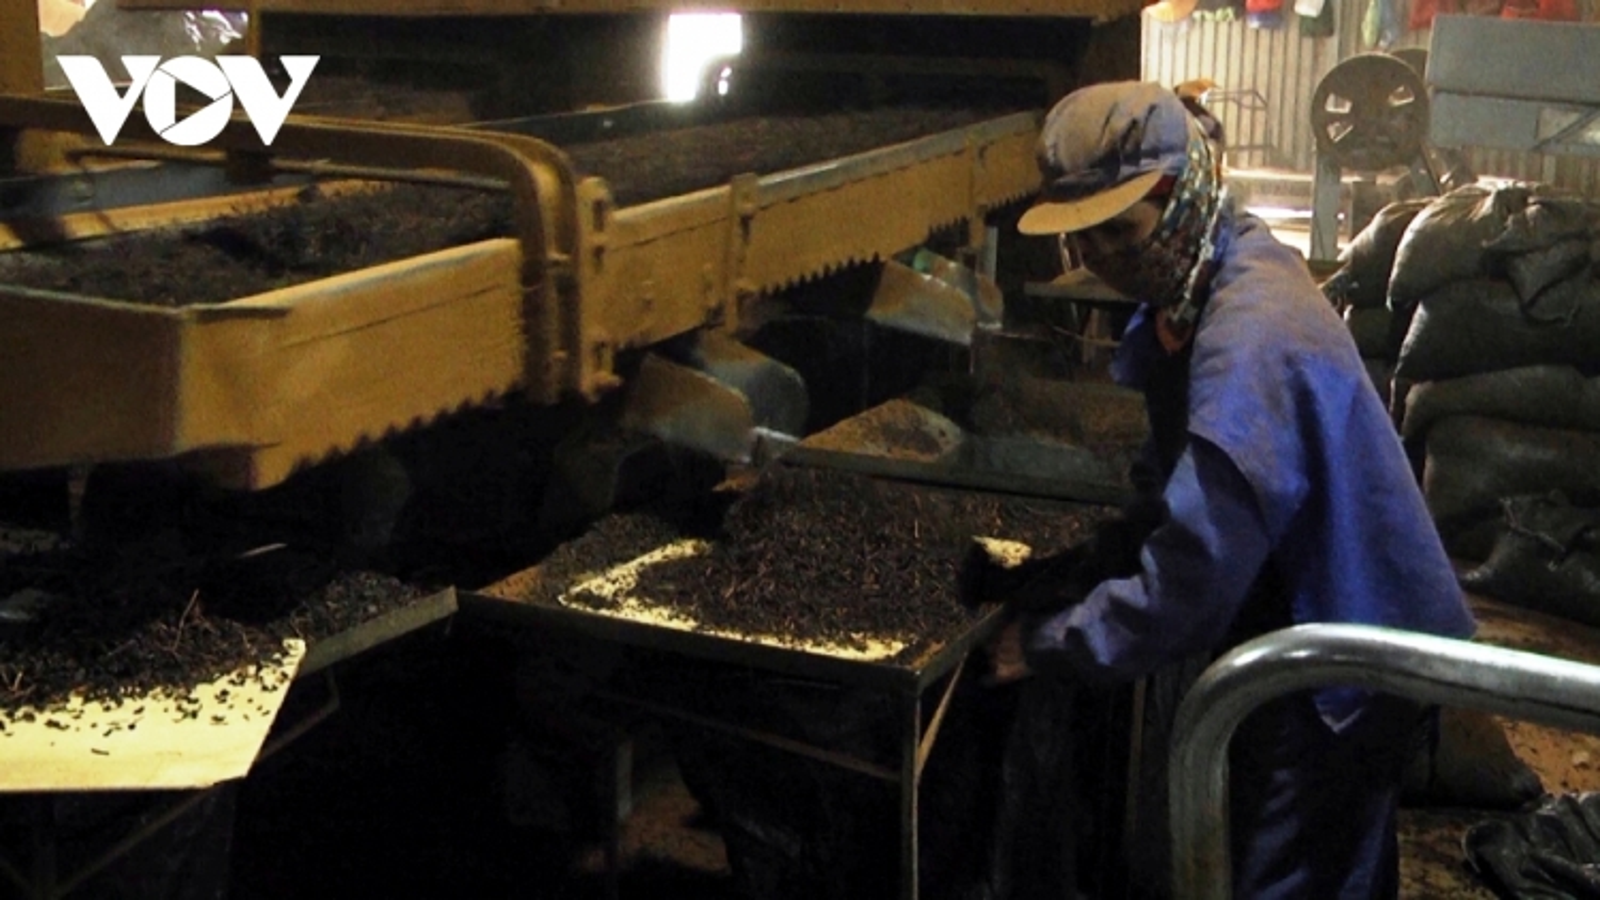 Tea exports to China, India rise sharply